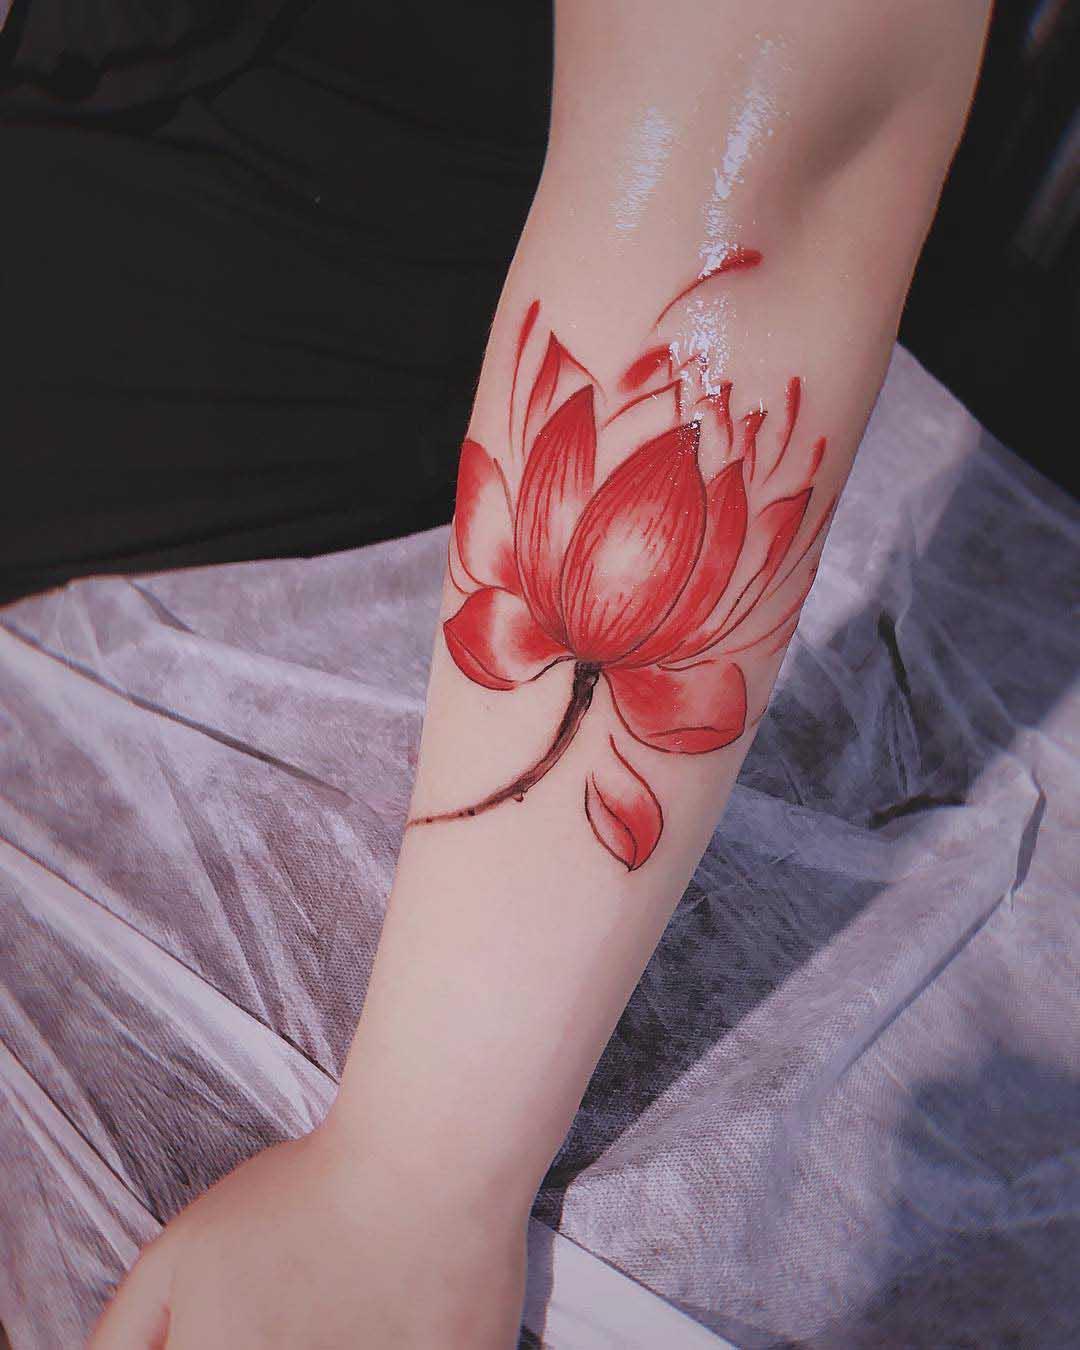 arm tattoo red lotus